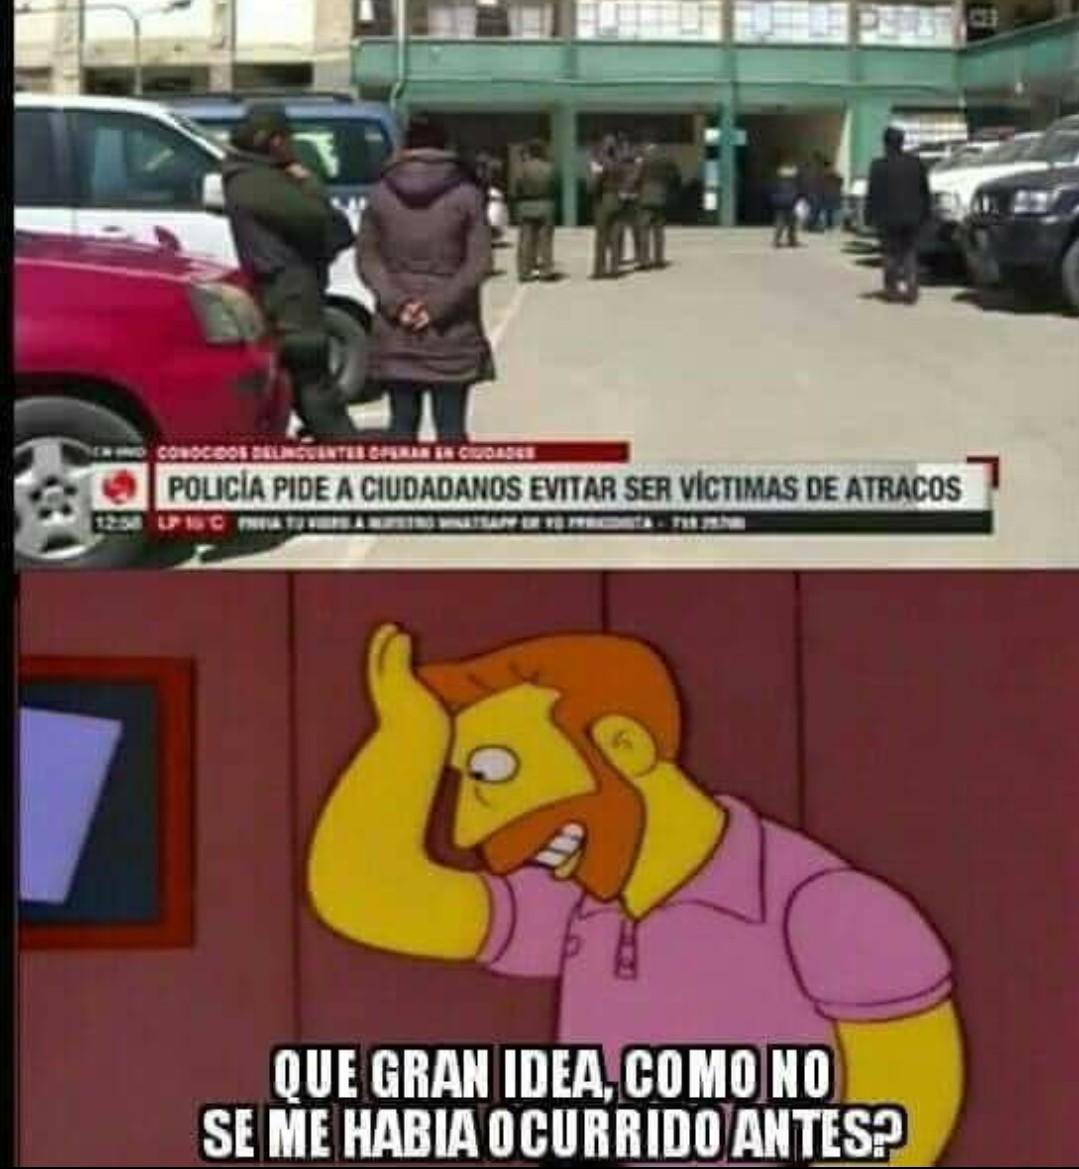 Argentina un pais con buena gente - meme